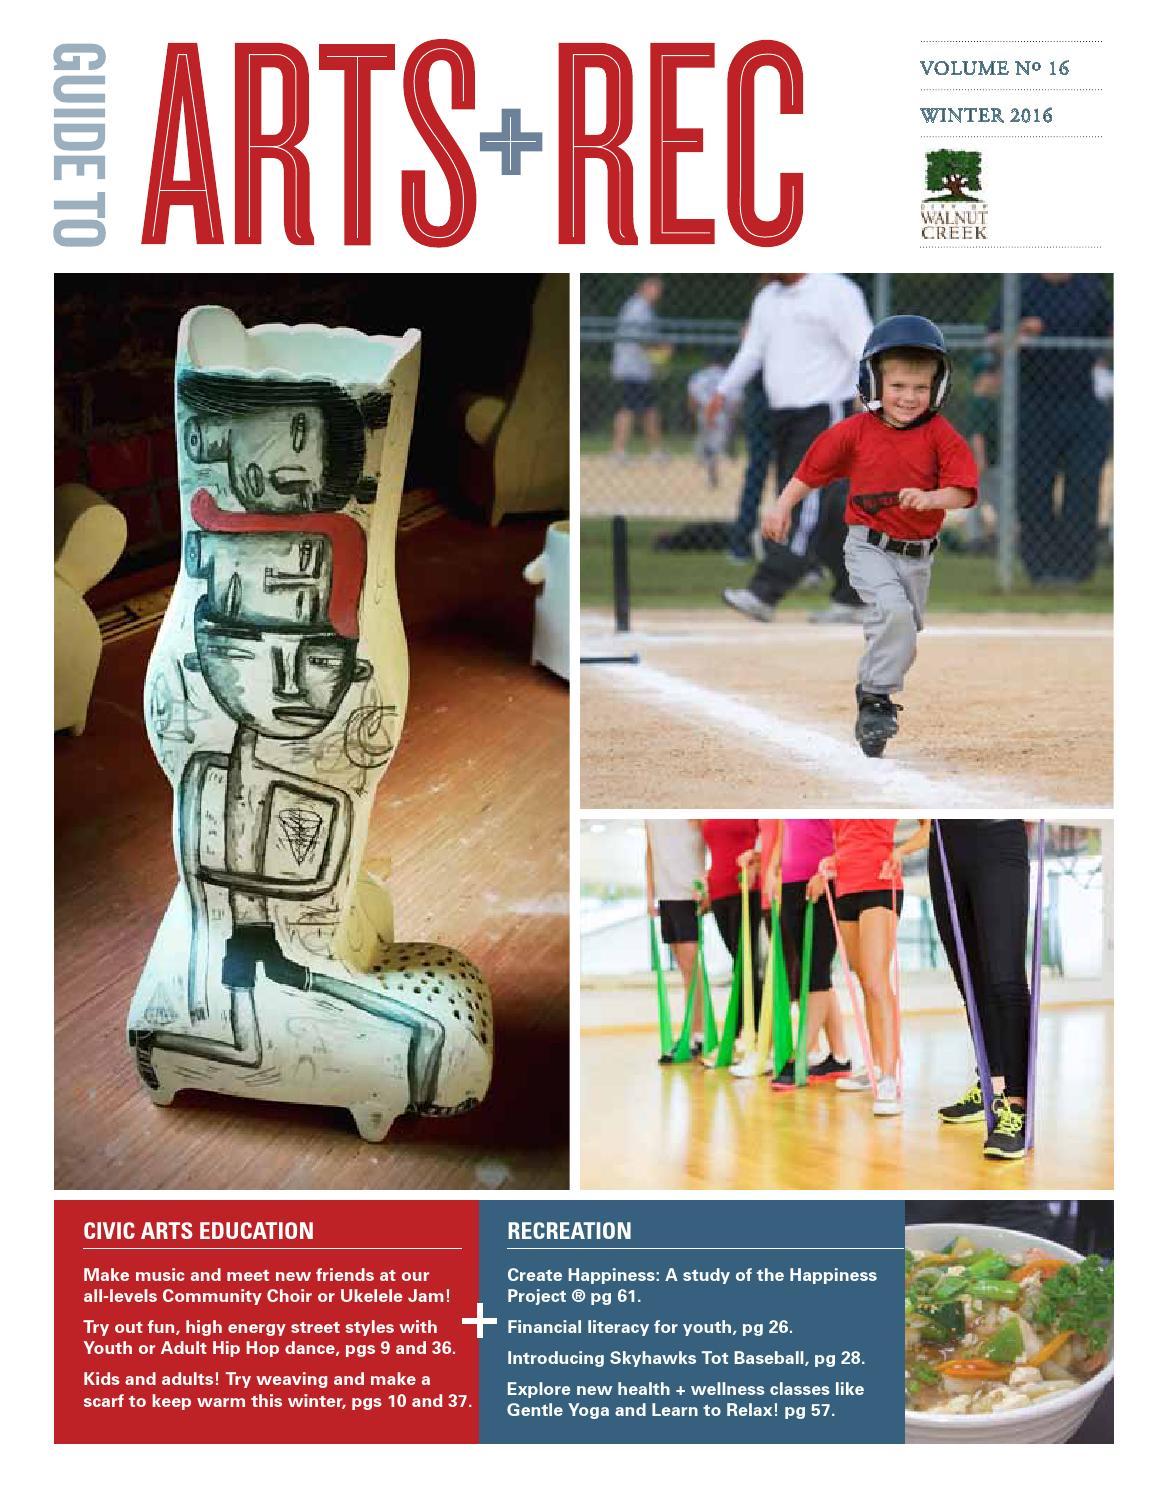 e1ed096bc7c City of Walnut Creek Guide to Arts+Rec - Winter 2016 by City of Walnut  Creek - issuu